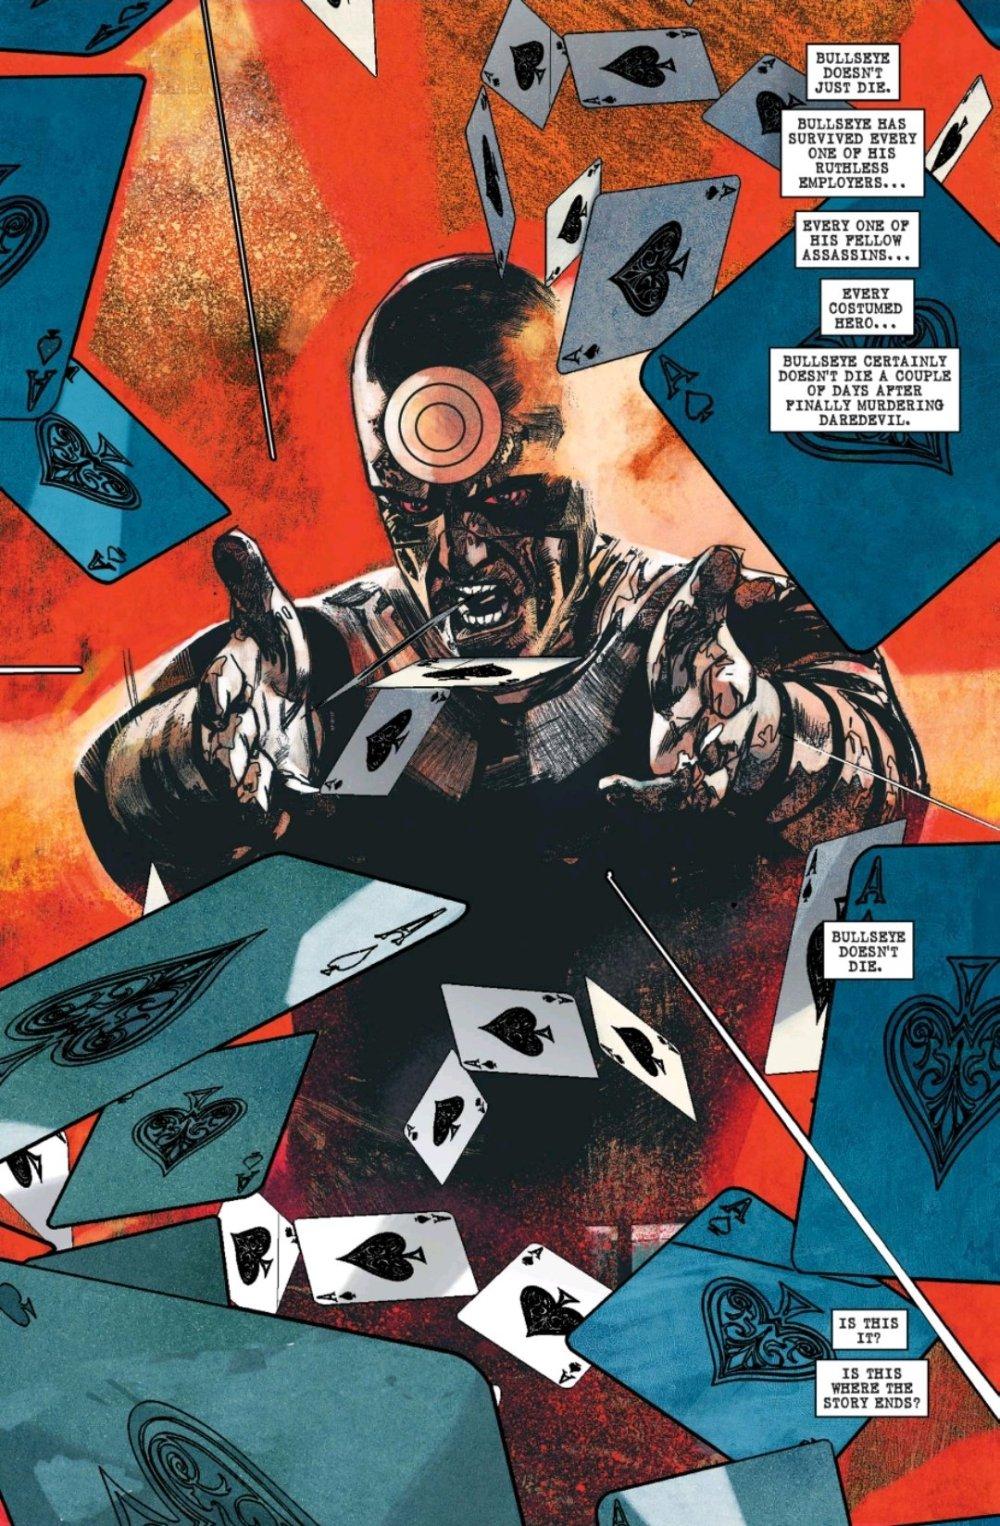 Bullseye throwing cards